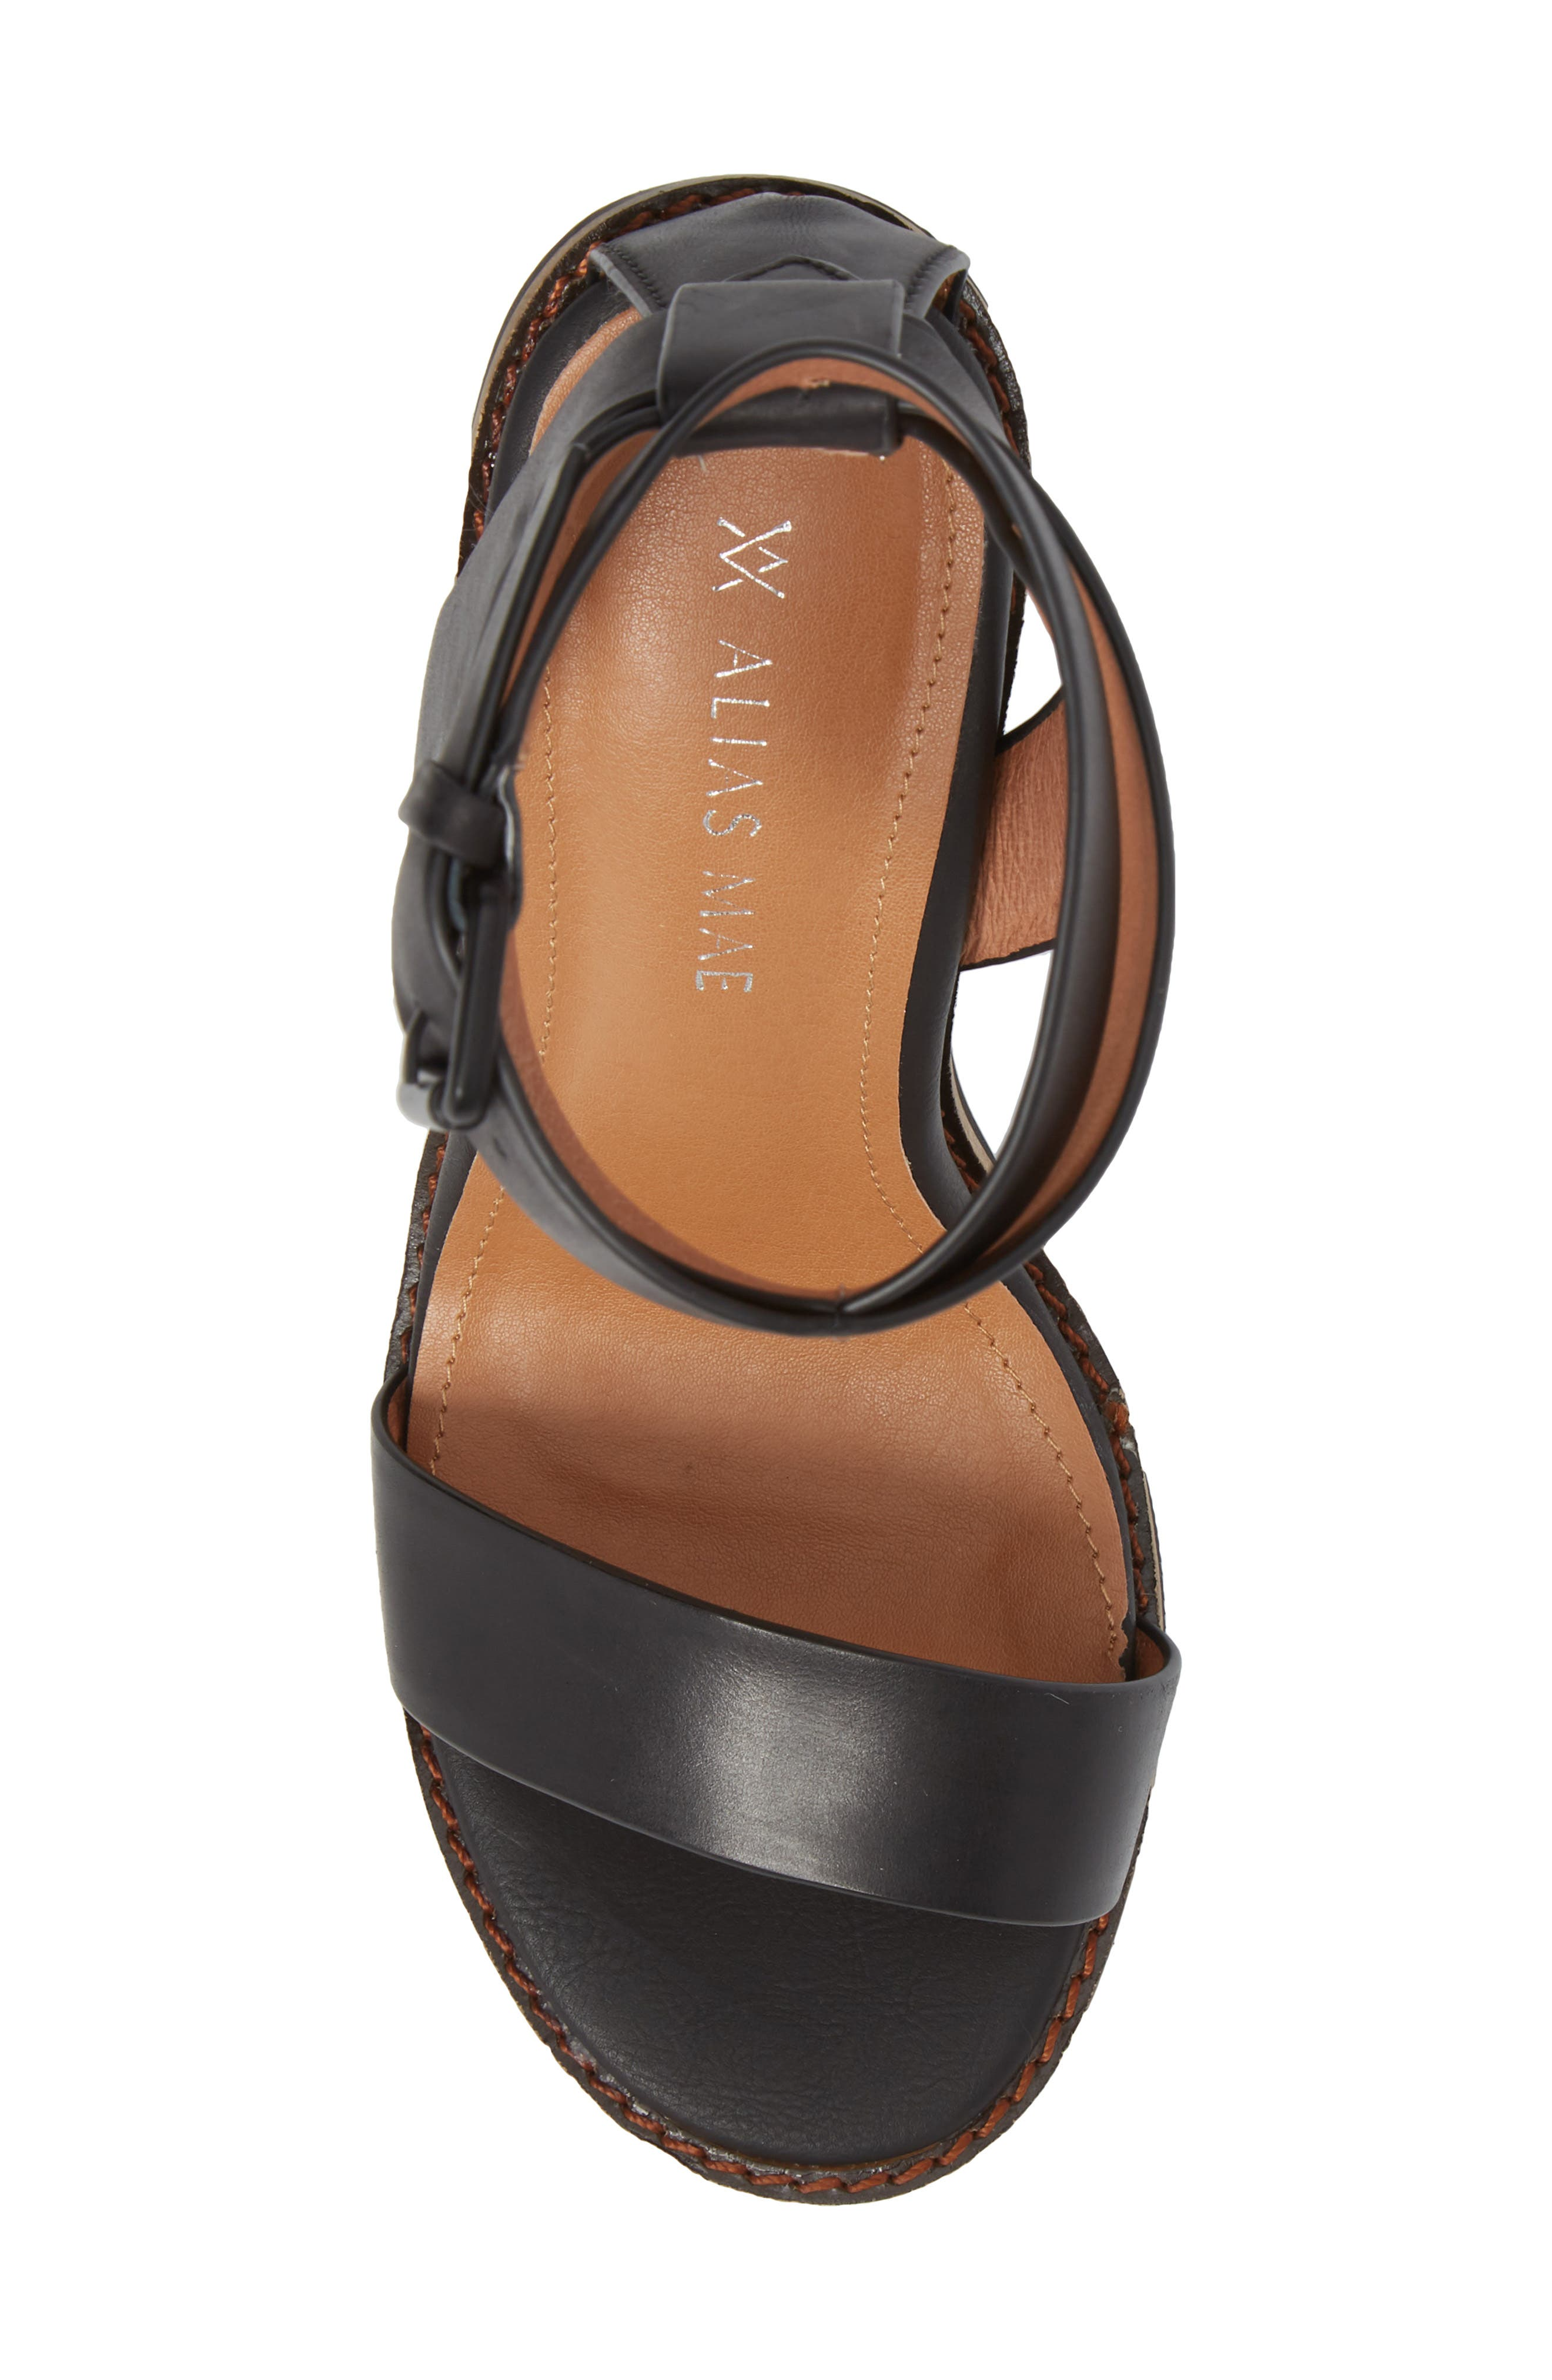 Calito Ankle Strap Sandal,                             Alternate thumbnail 5, color,                             001